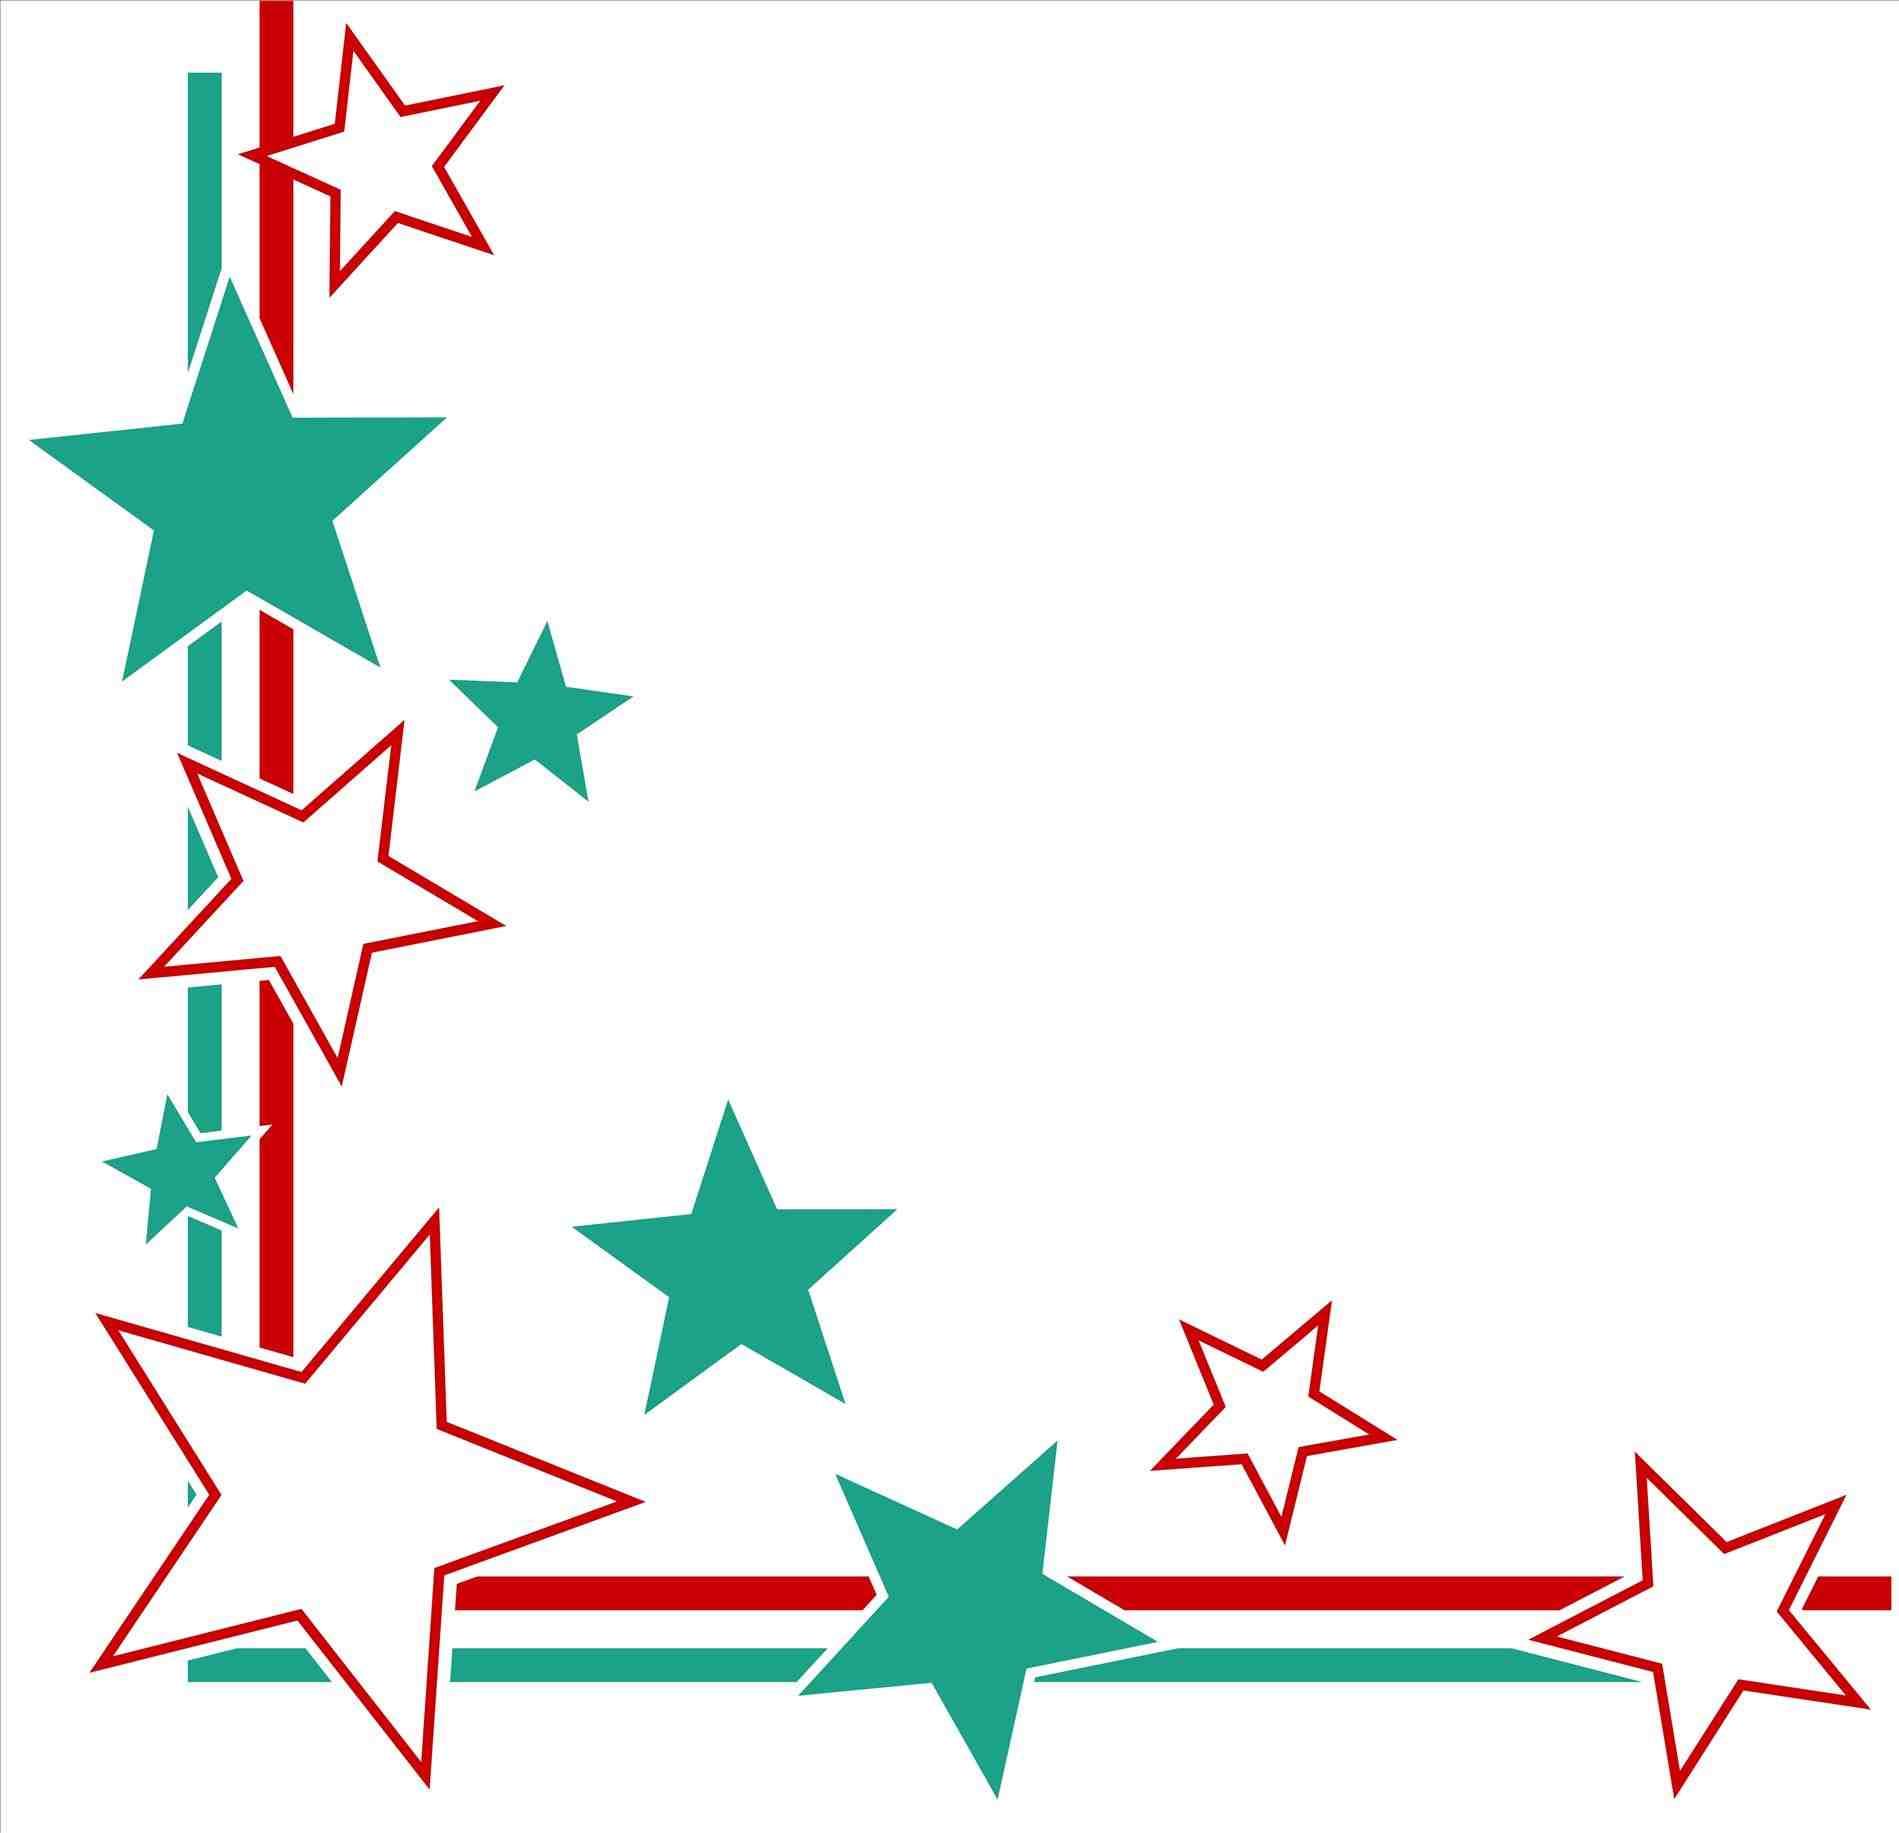 1899x1833 Christmas Clipart Corner Borders Cheminee.website